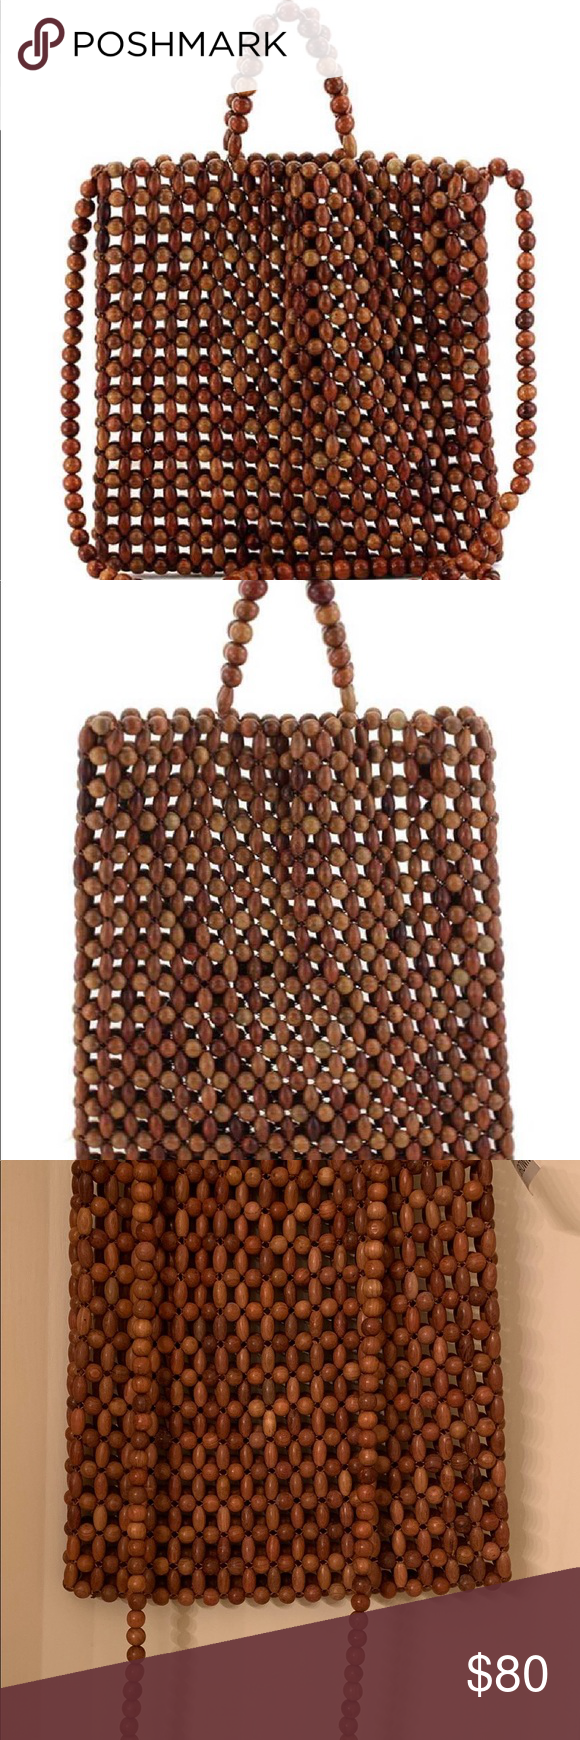 Wooden Tote Bag #woodentotebag